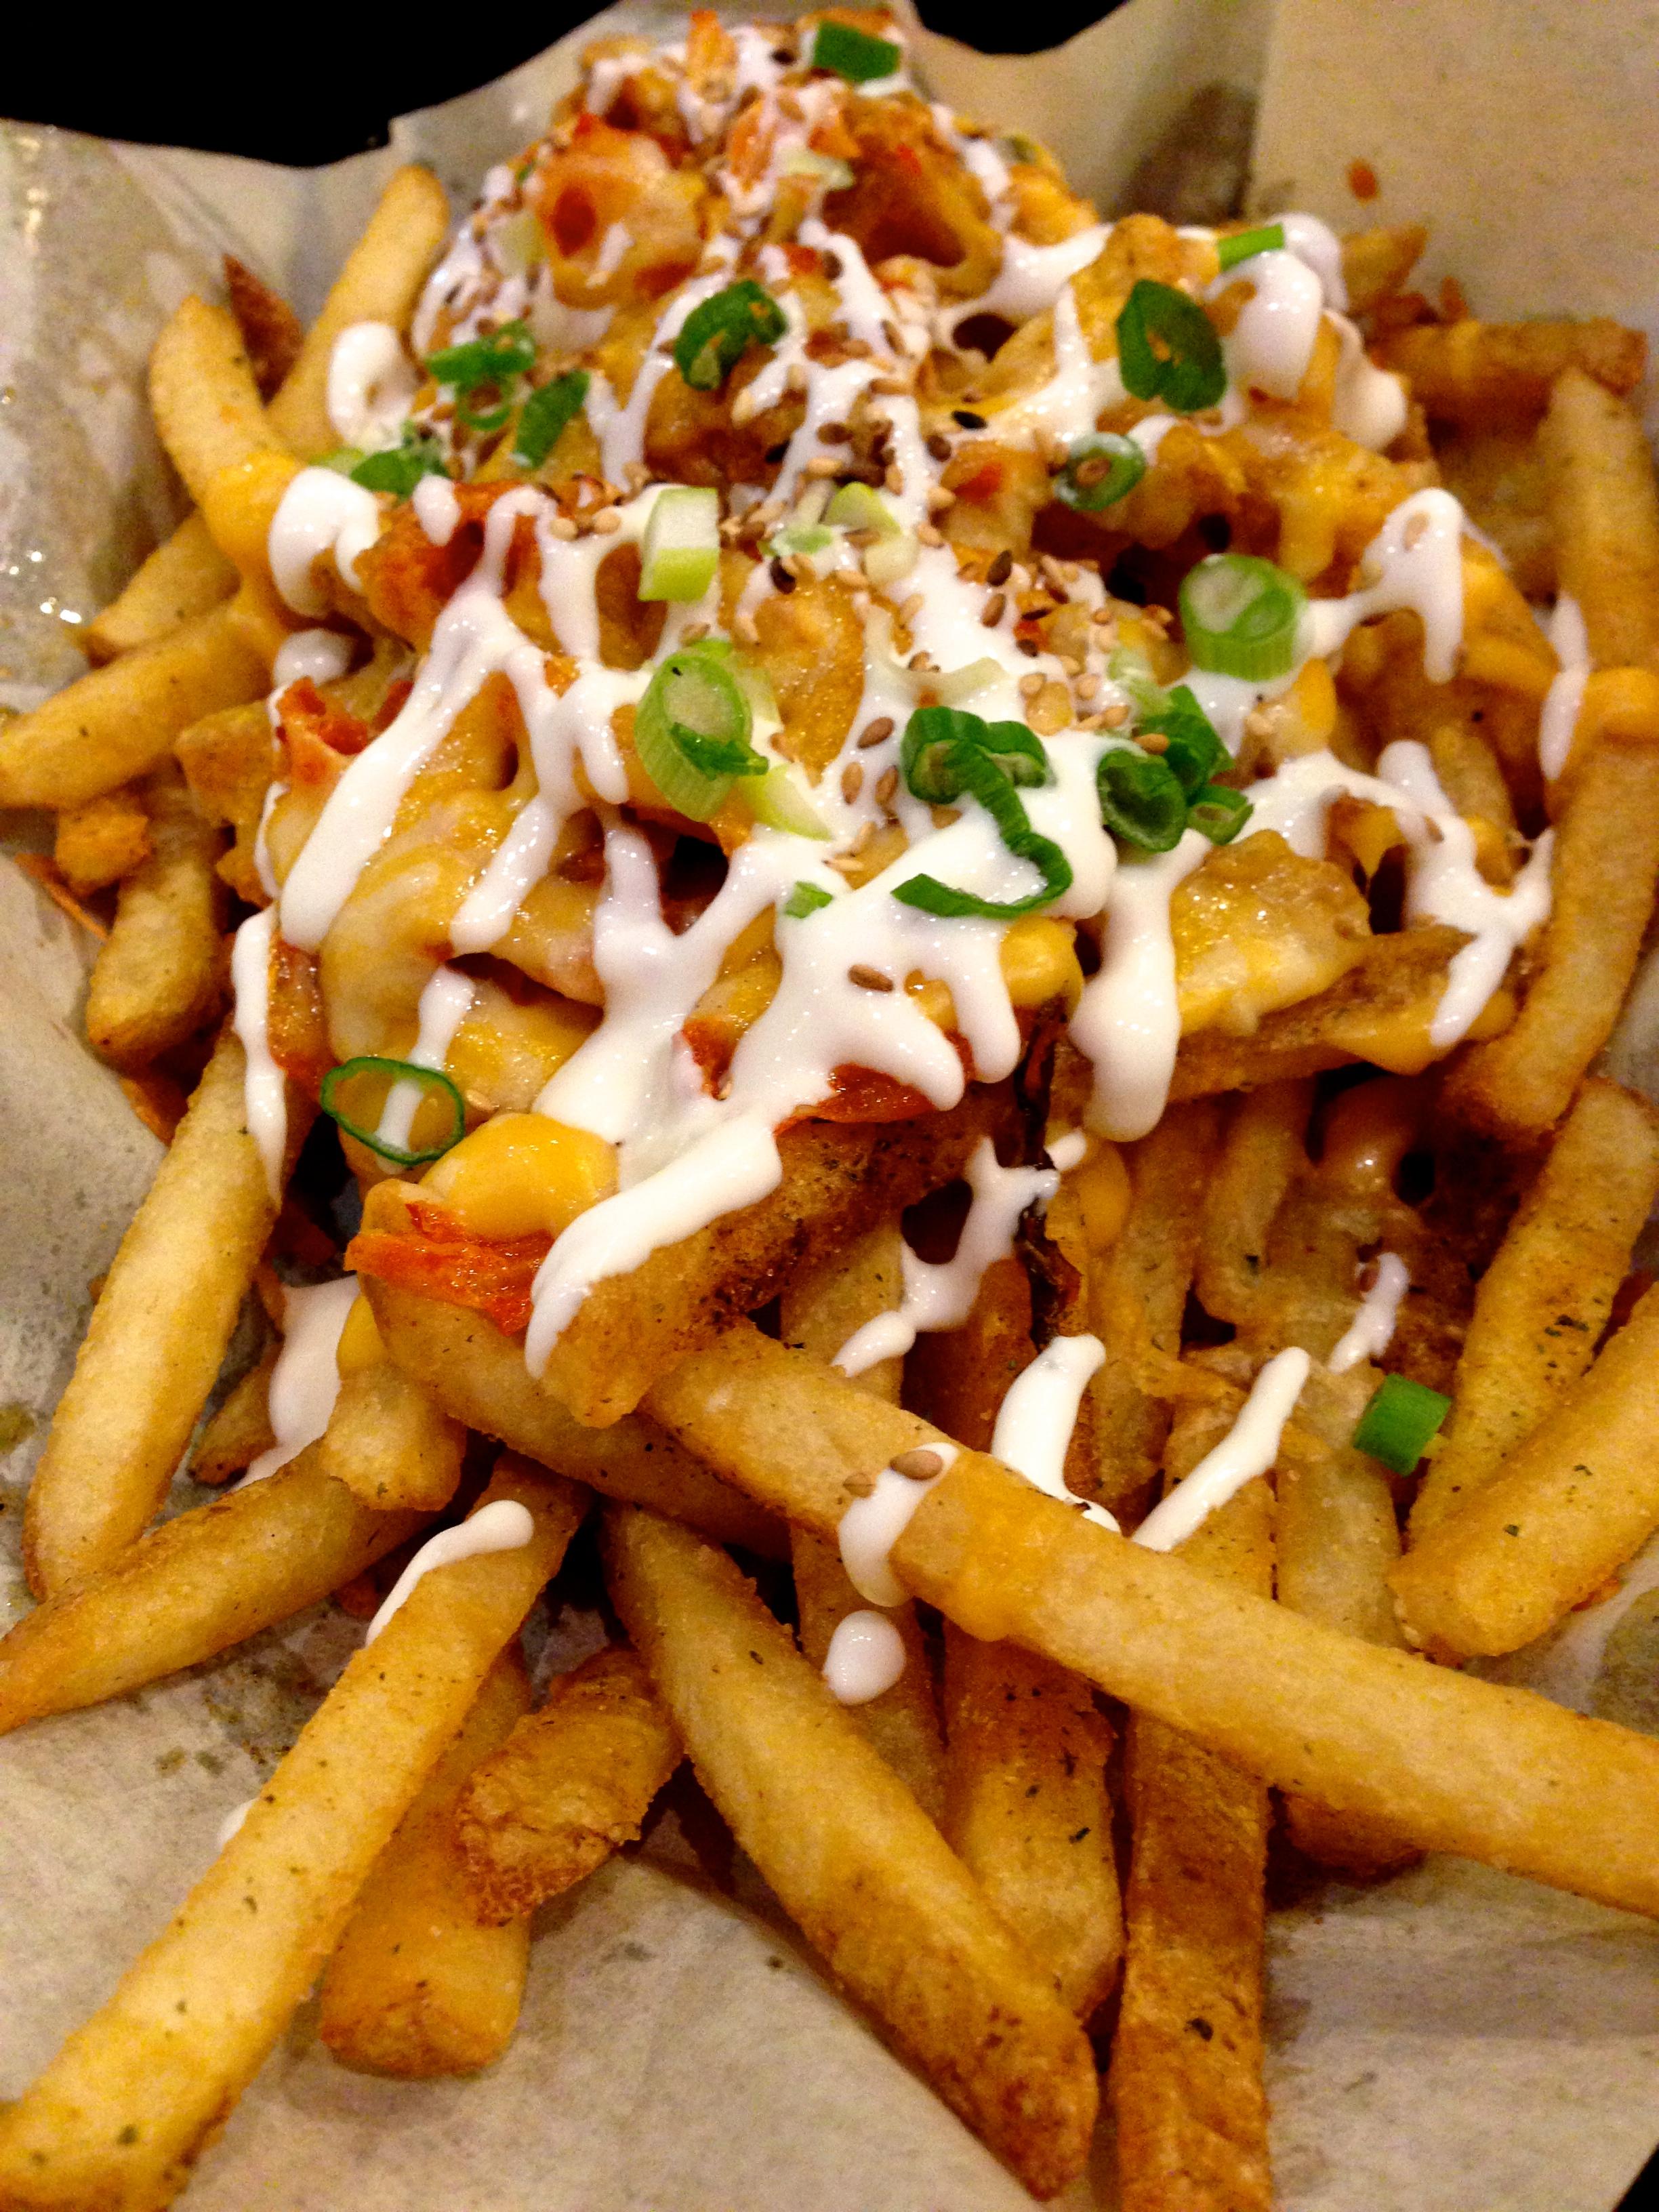 Figure 4. Kimchi fries